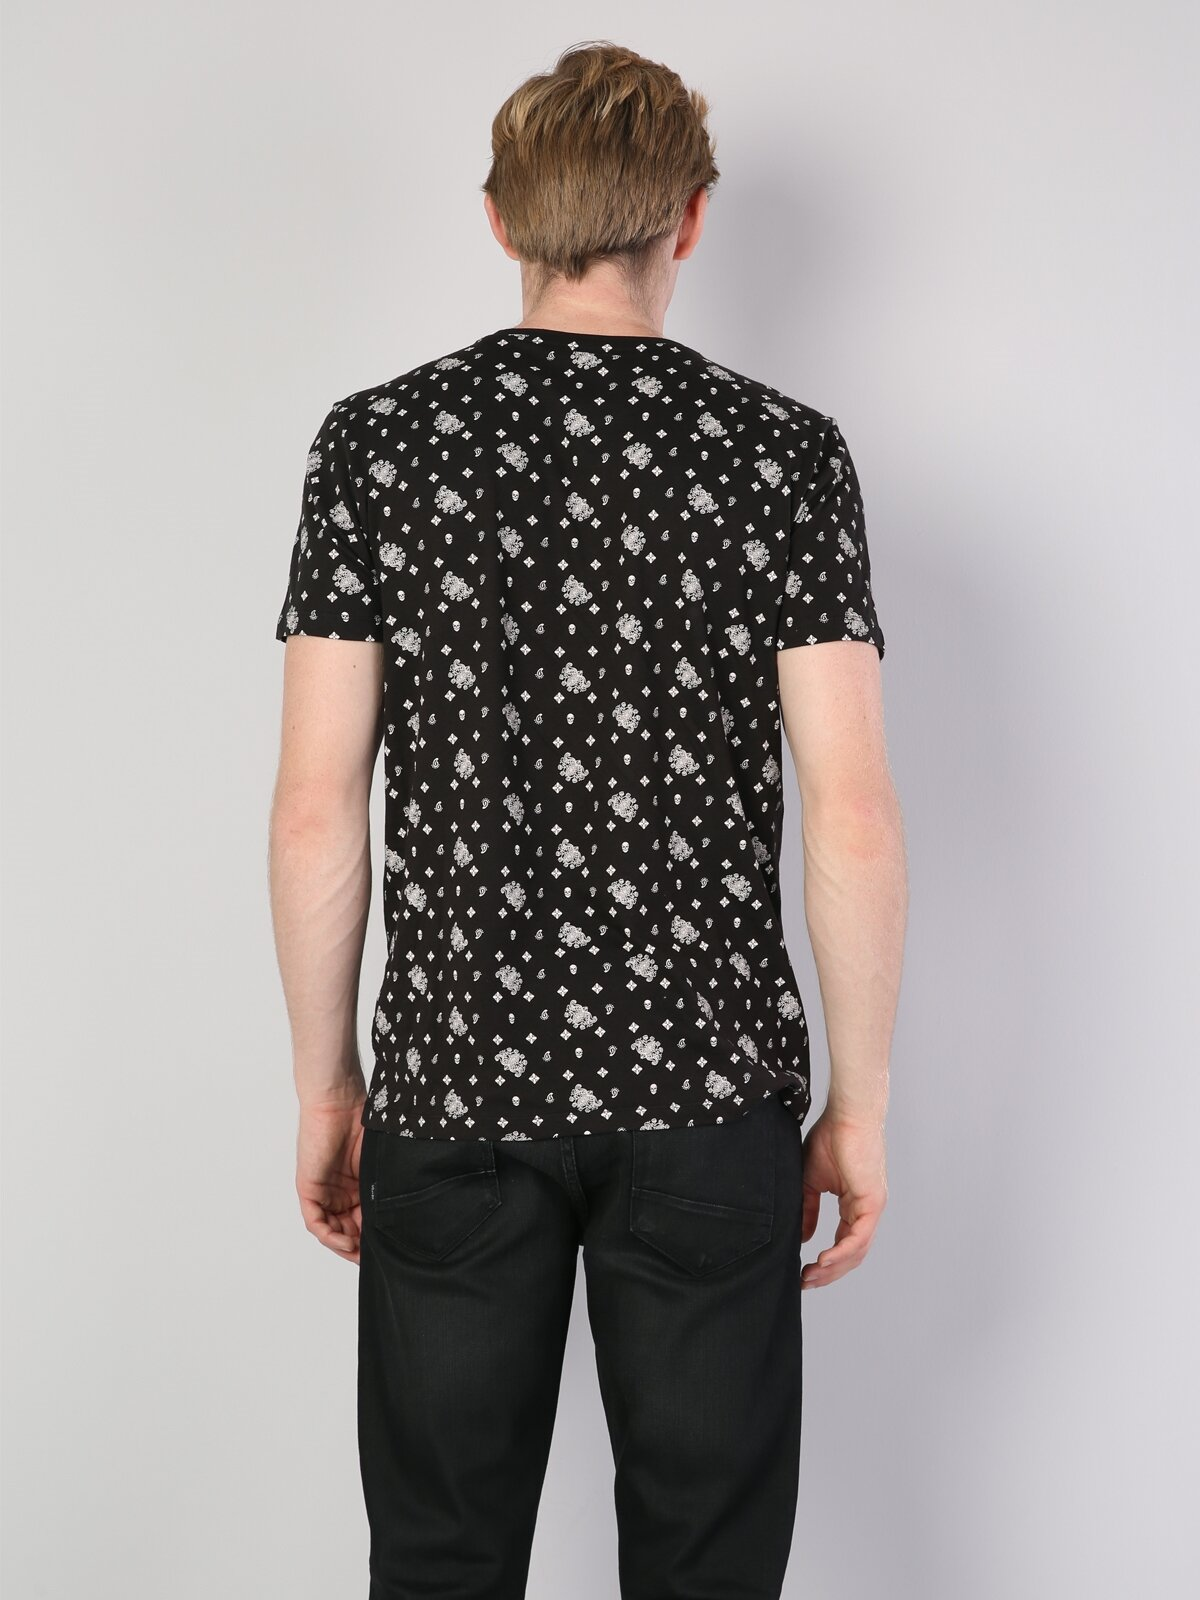 Siyah Yuvarlak Yaka Erkek Kısa Kol Tişört